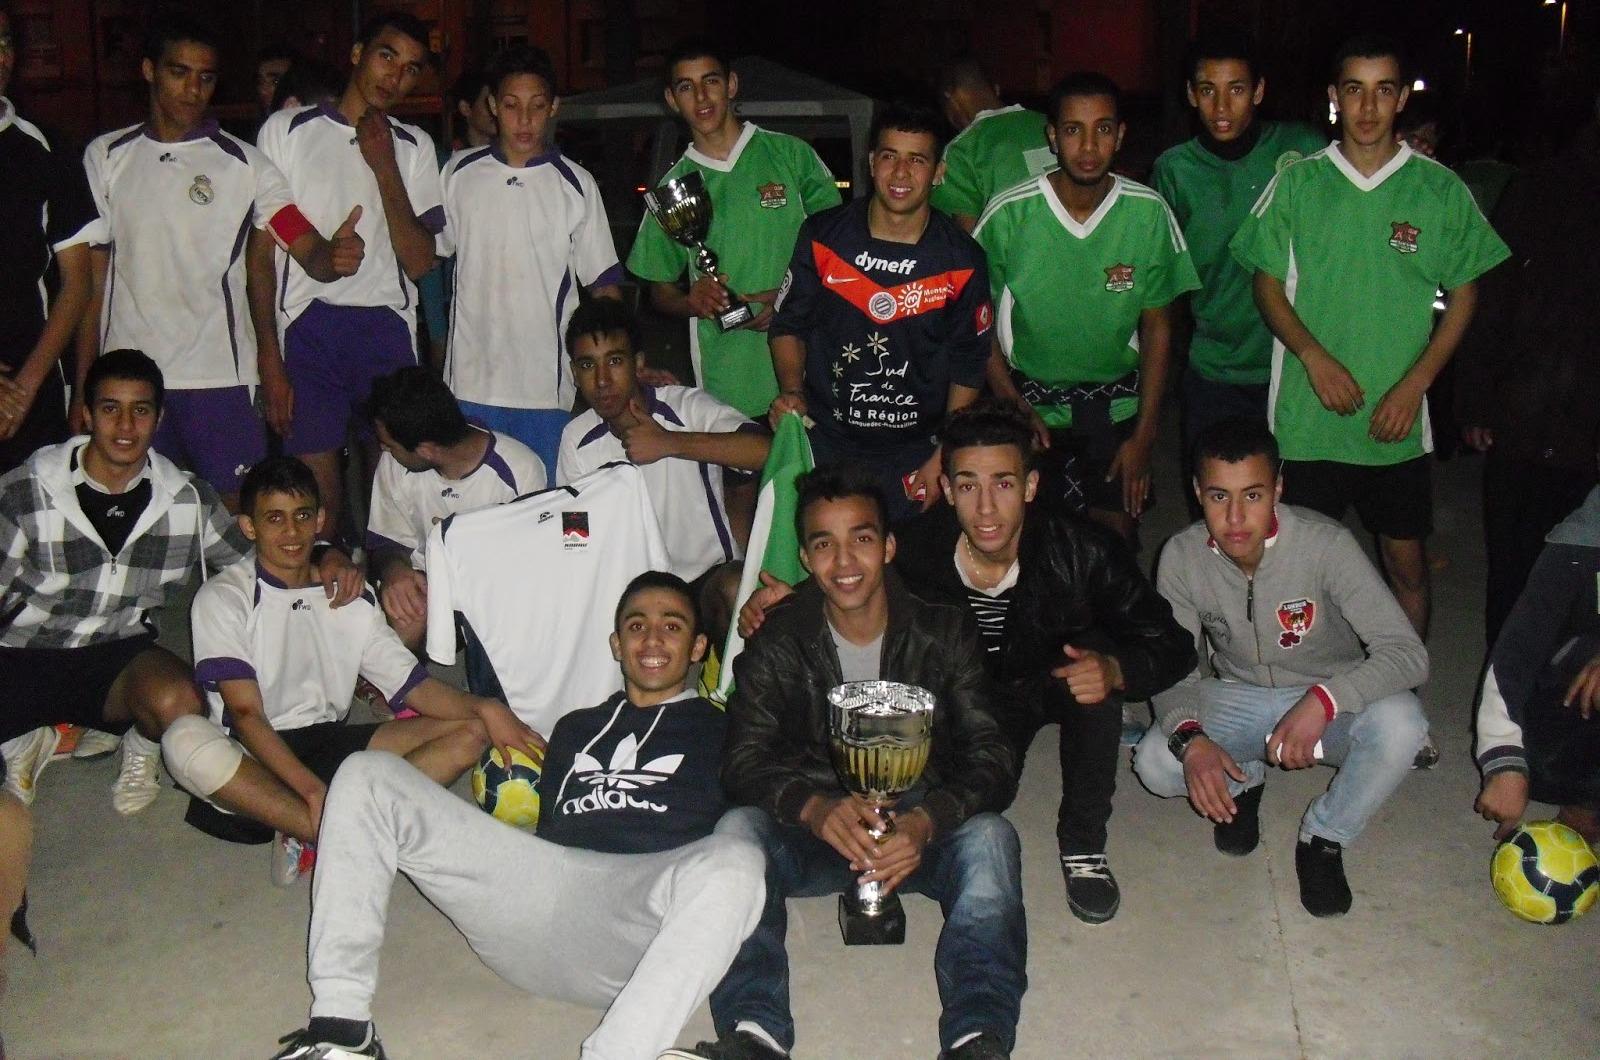 Jornada Deportiva organizada por la comunidad islámica Tawasul en el Tarragonés